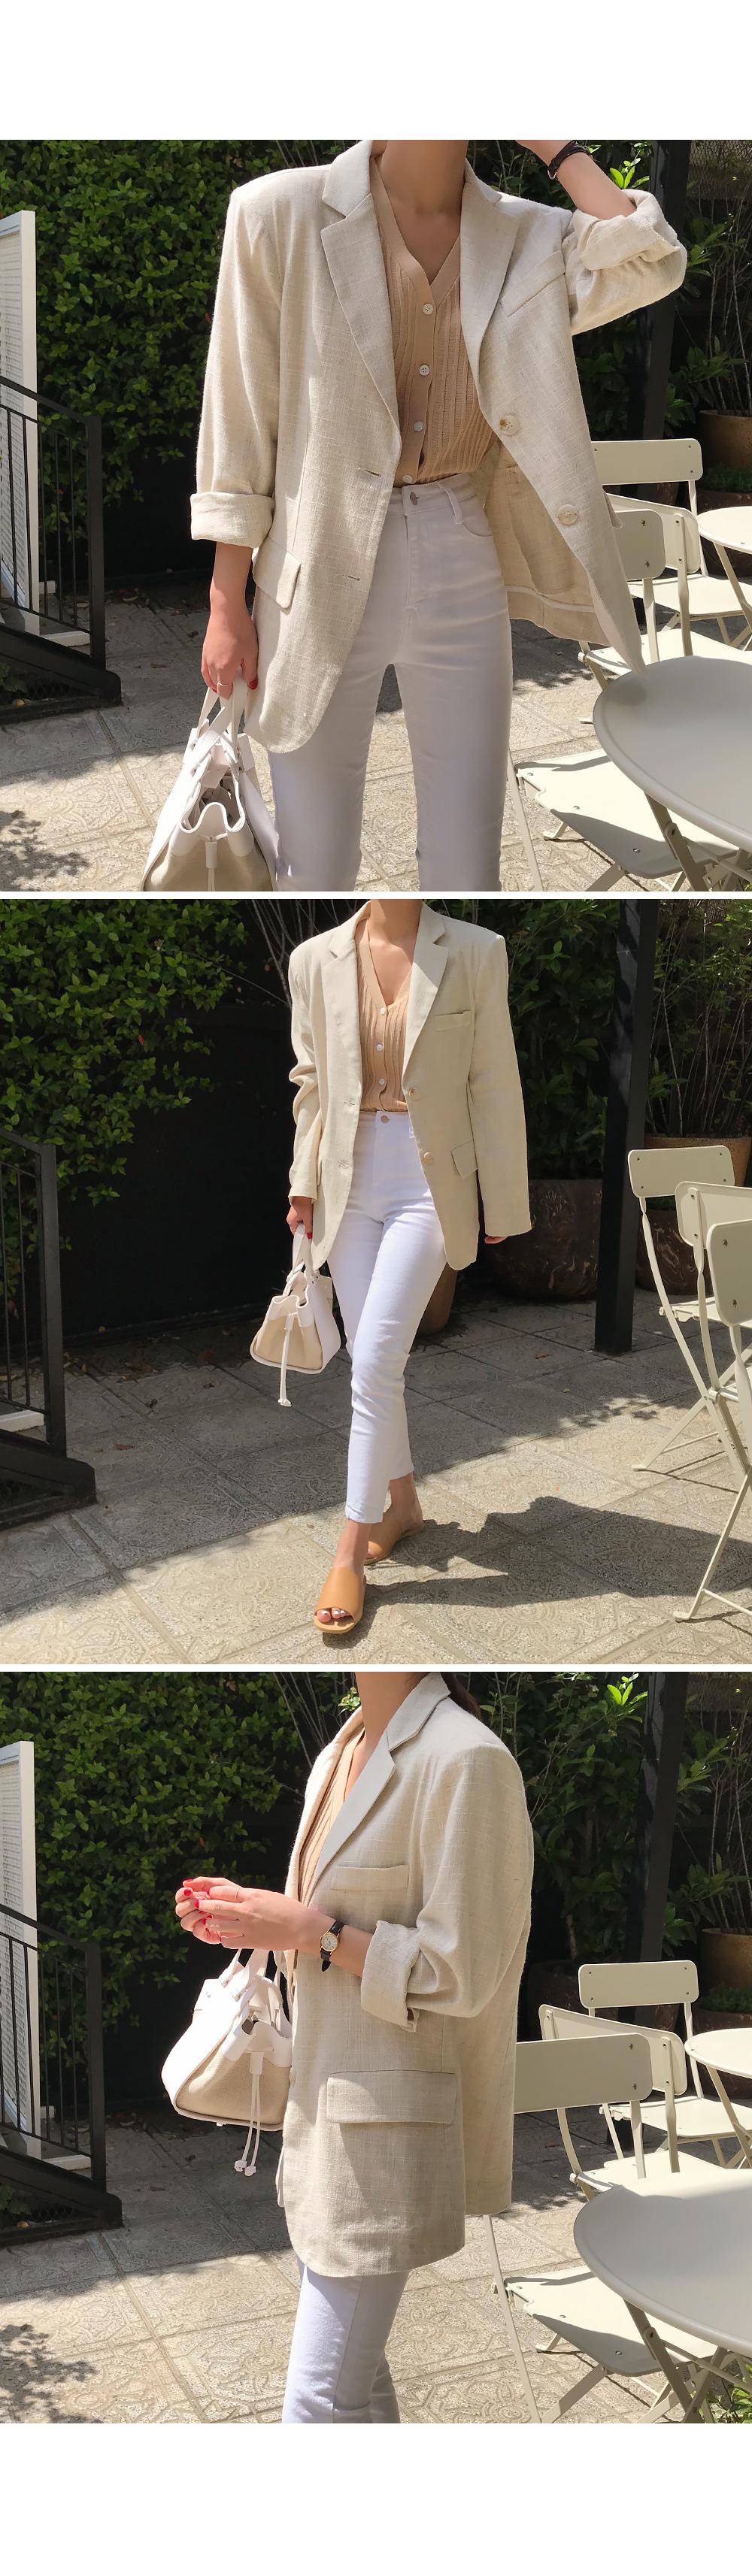 Summer Herringbone Linen Jacket-holiholic.com